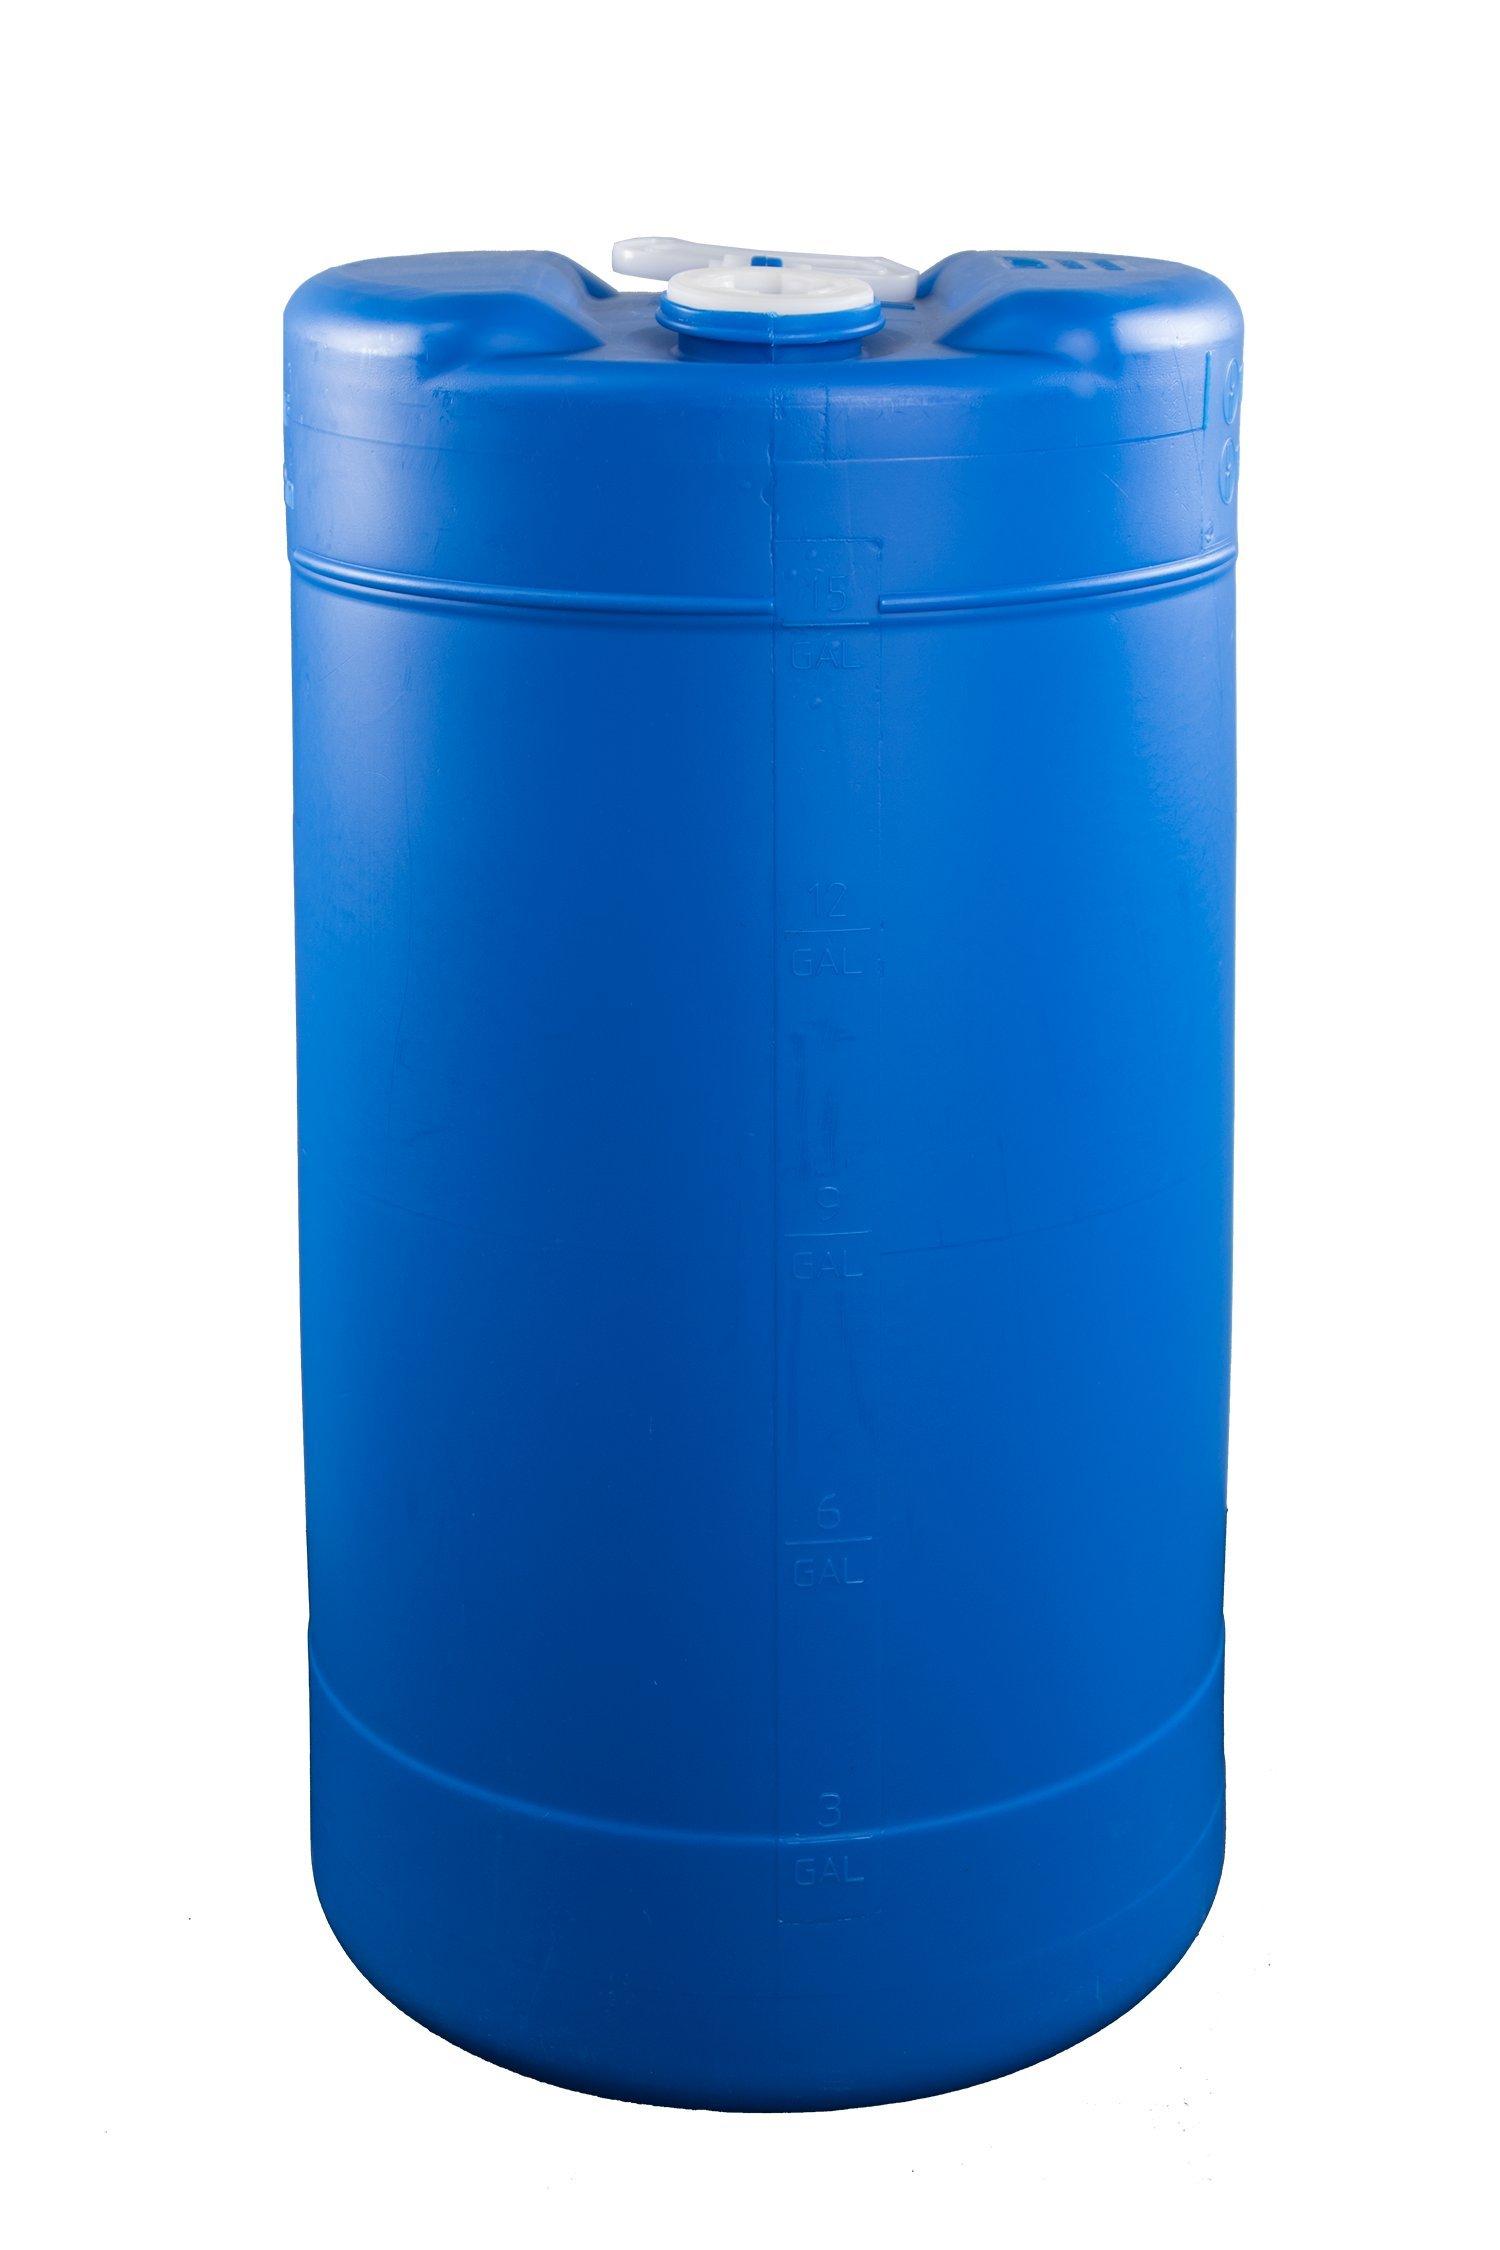 15 Gallon Emergency Water Storage Barrel - BPA Free, Portable, Food Grade Plastic - Survival Preparedness Water Supply by Legacy Premium Food Storage